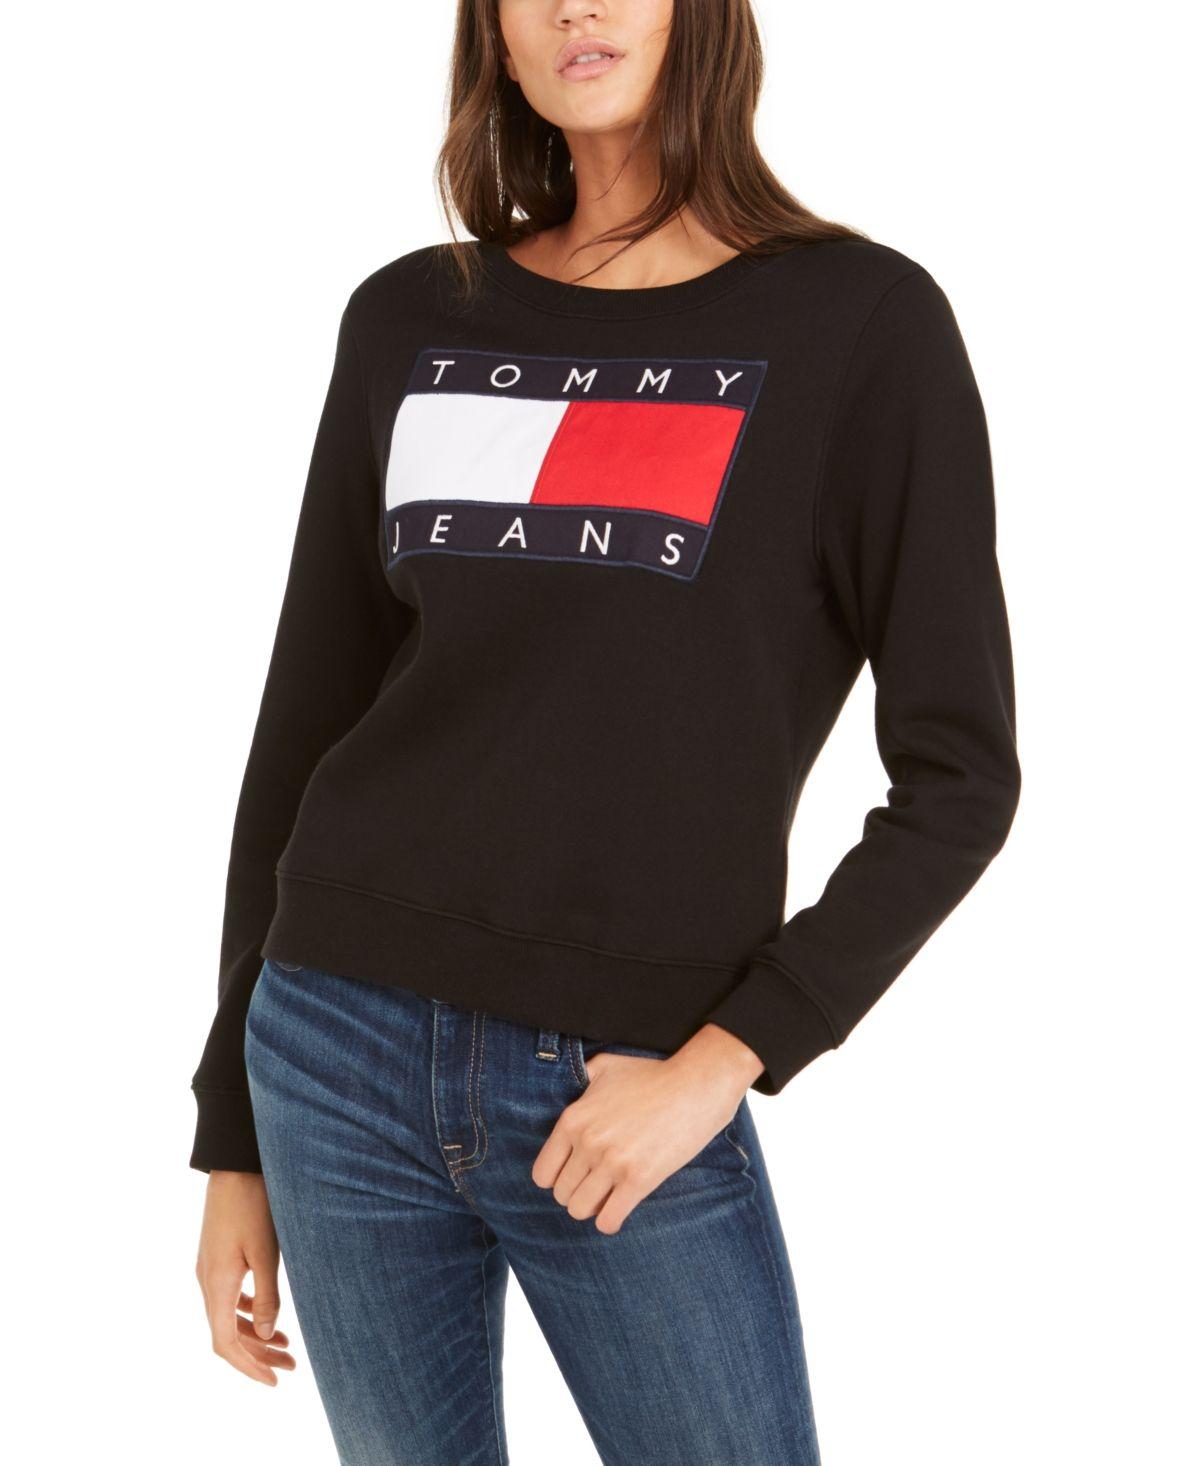 Tommy Jeans Flag Sweatshirt Black In 2021 Jeans Logo Sweatshirts Crew Neck Sweatshirt [ 1466 x 1200 Pixel ]